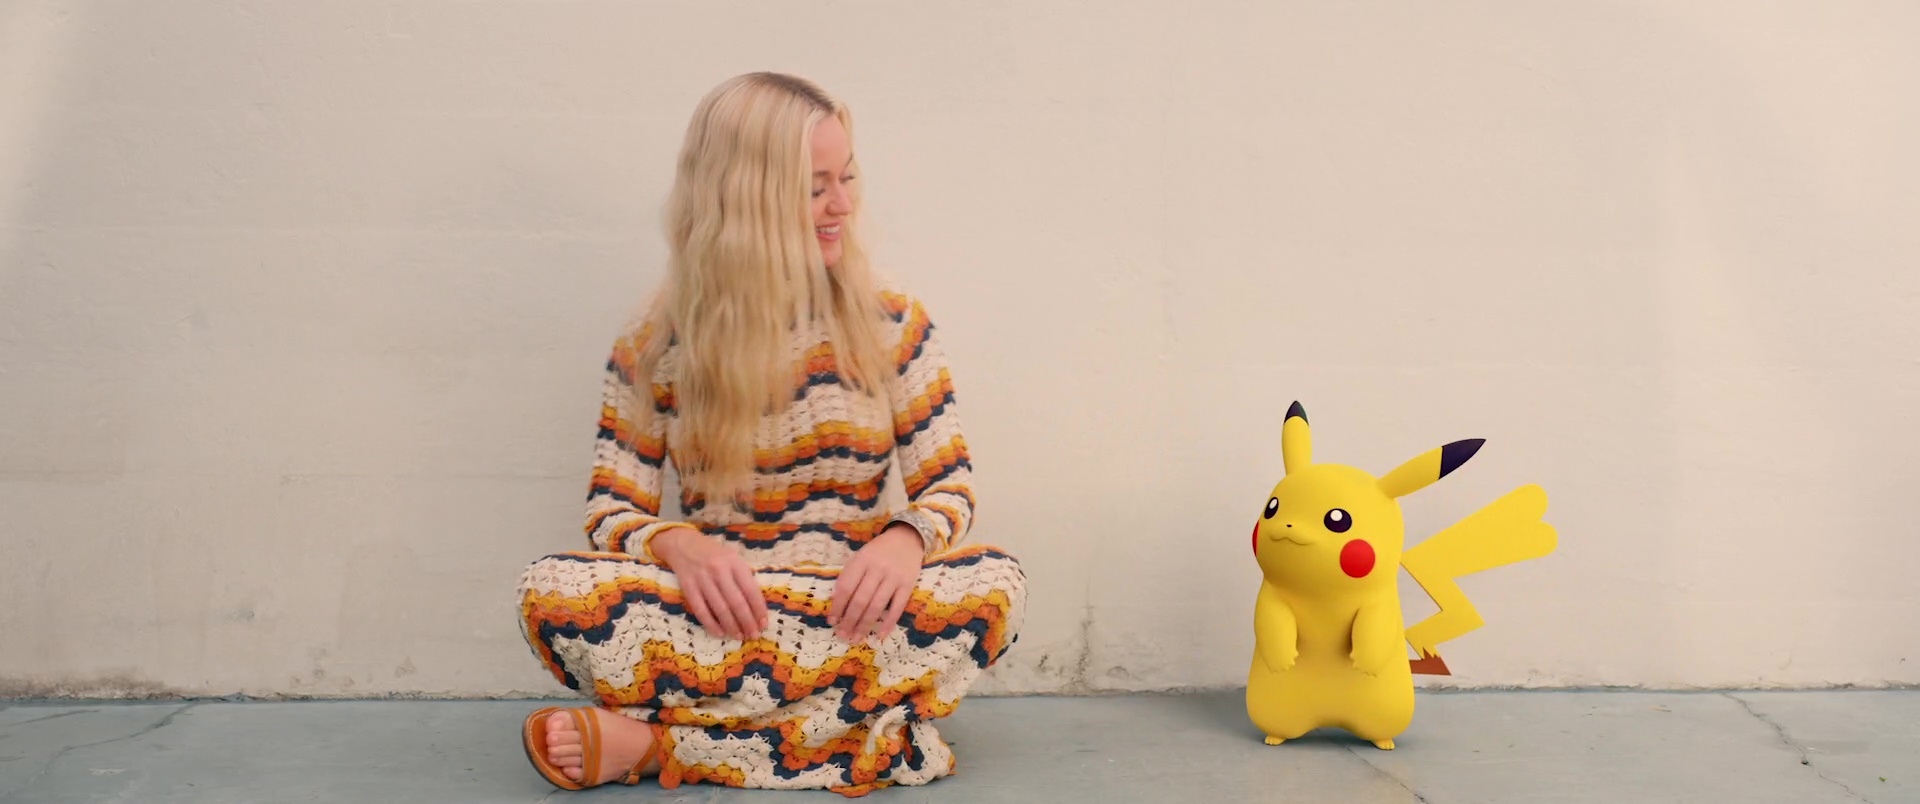 katy perry clip electric pokemon 25th anniversary pikachu